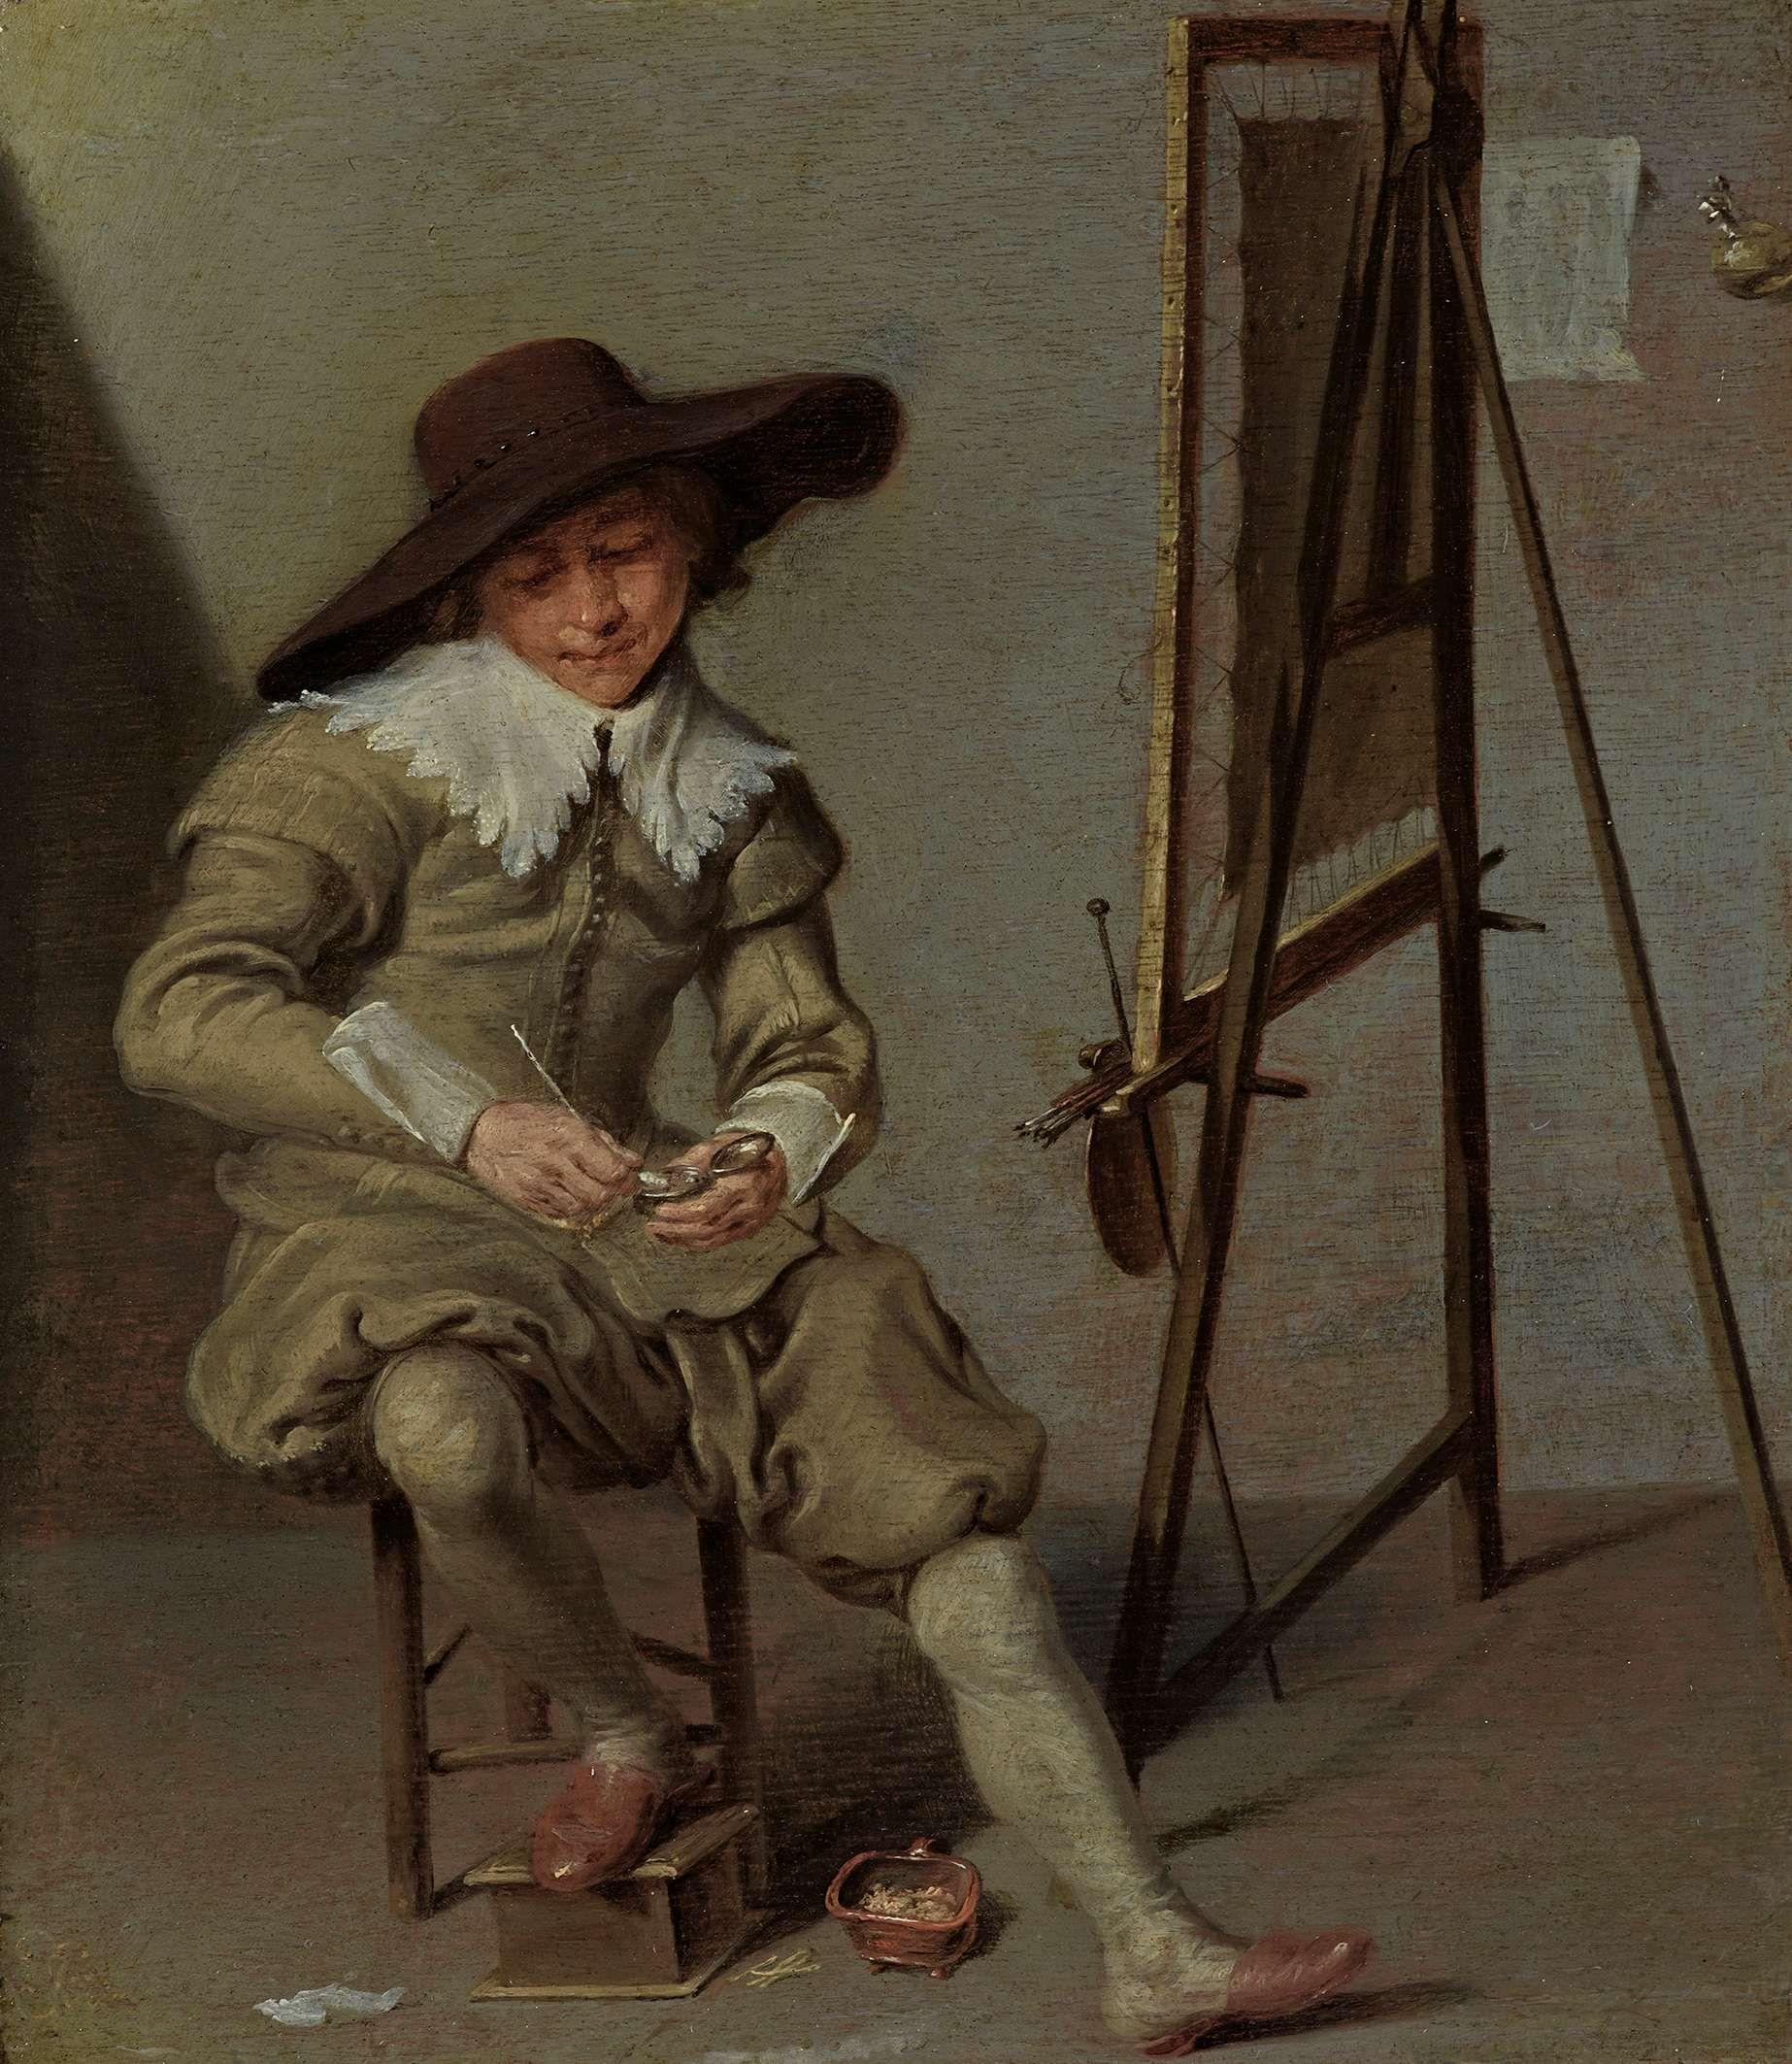 Jacob van Velsen (1597-1656) - A Painter at His Easel